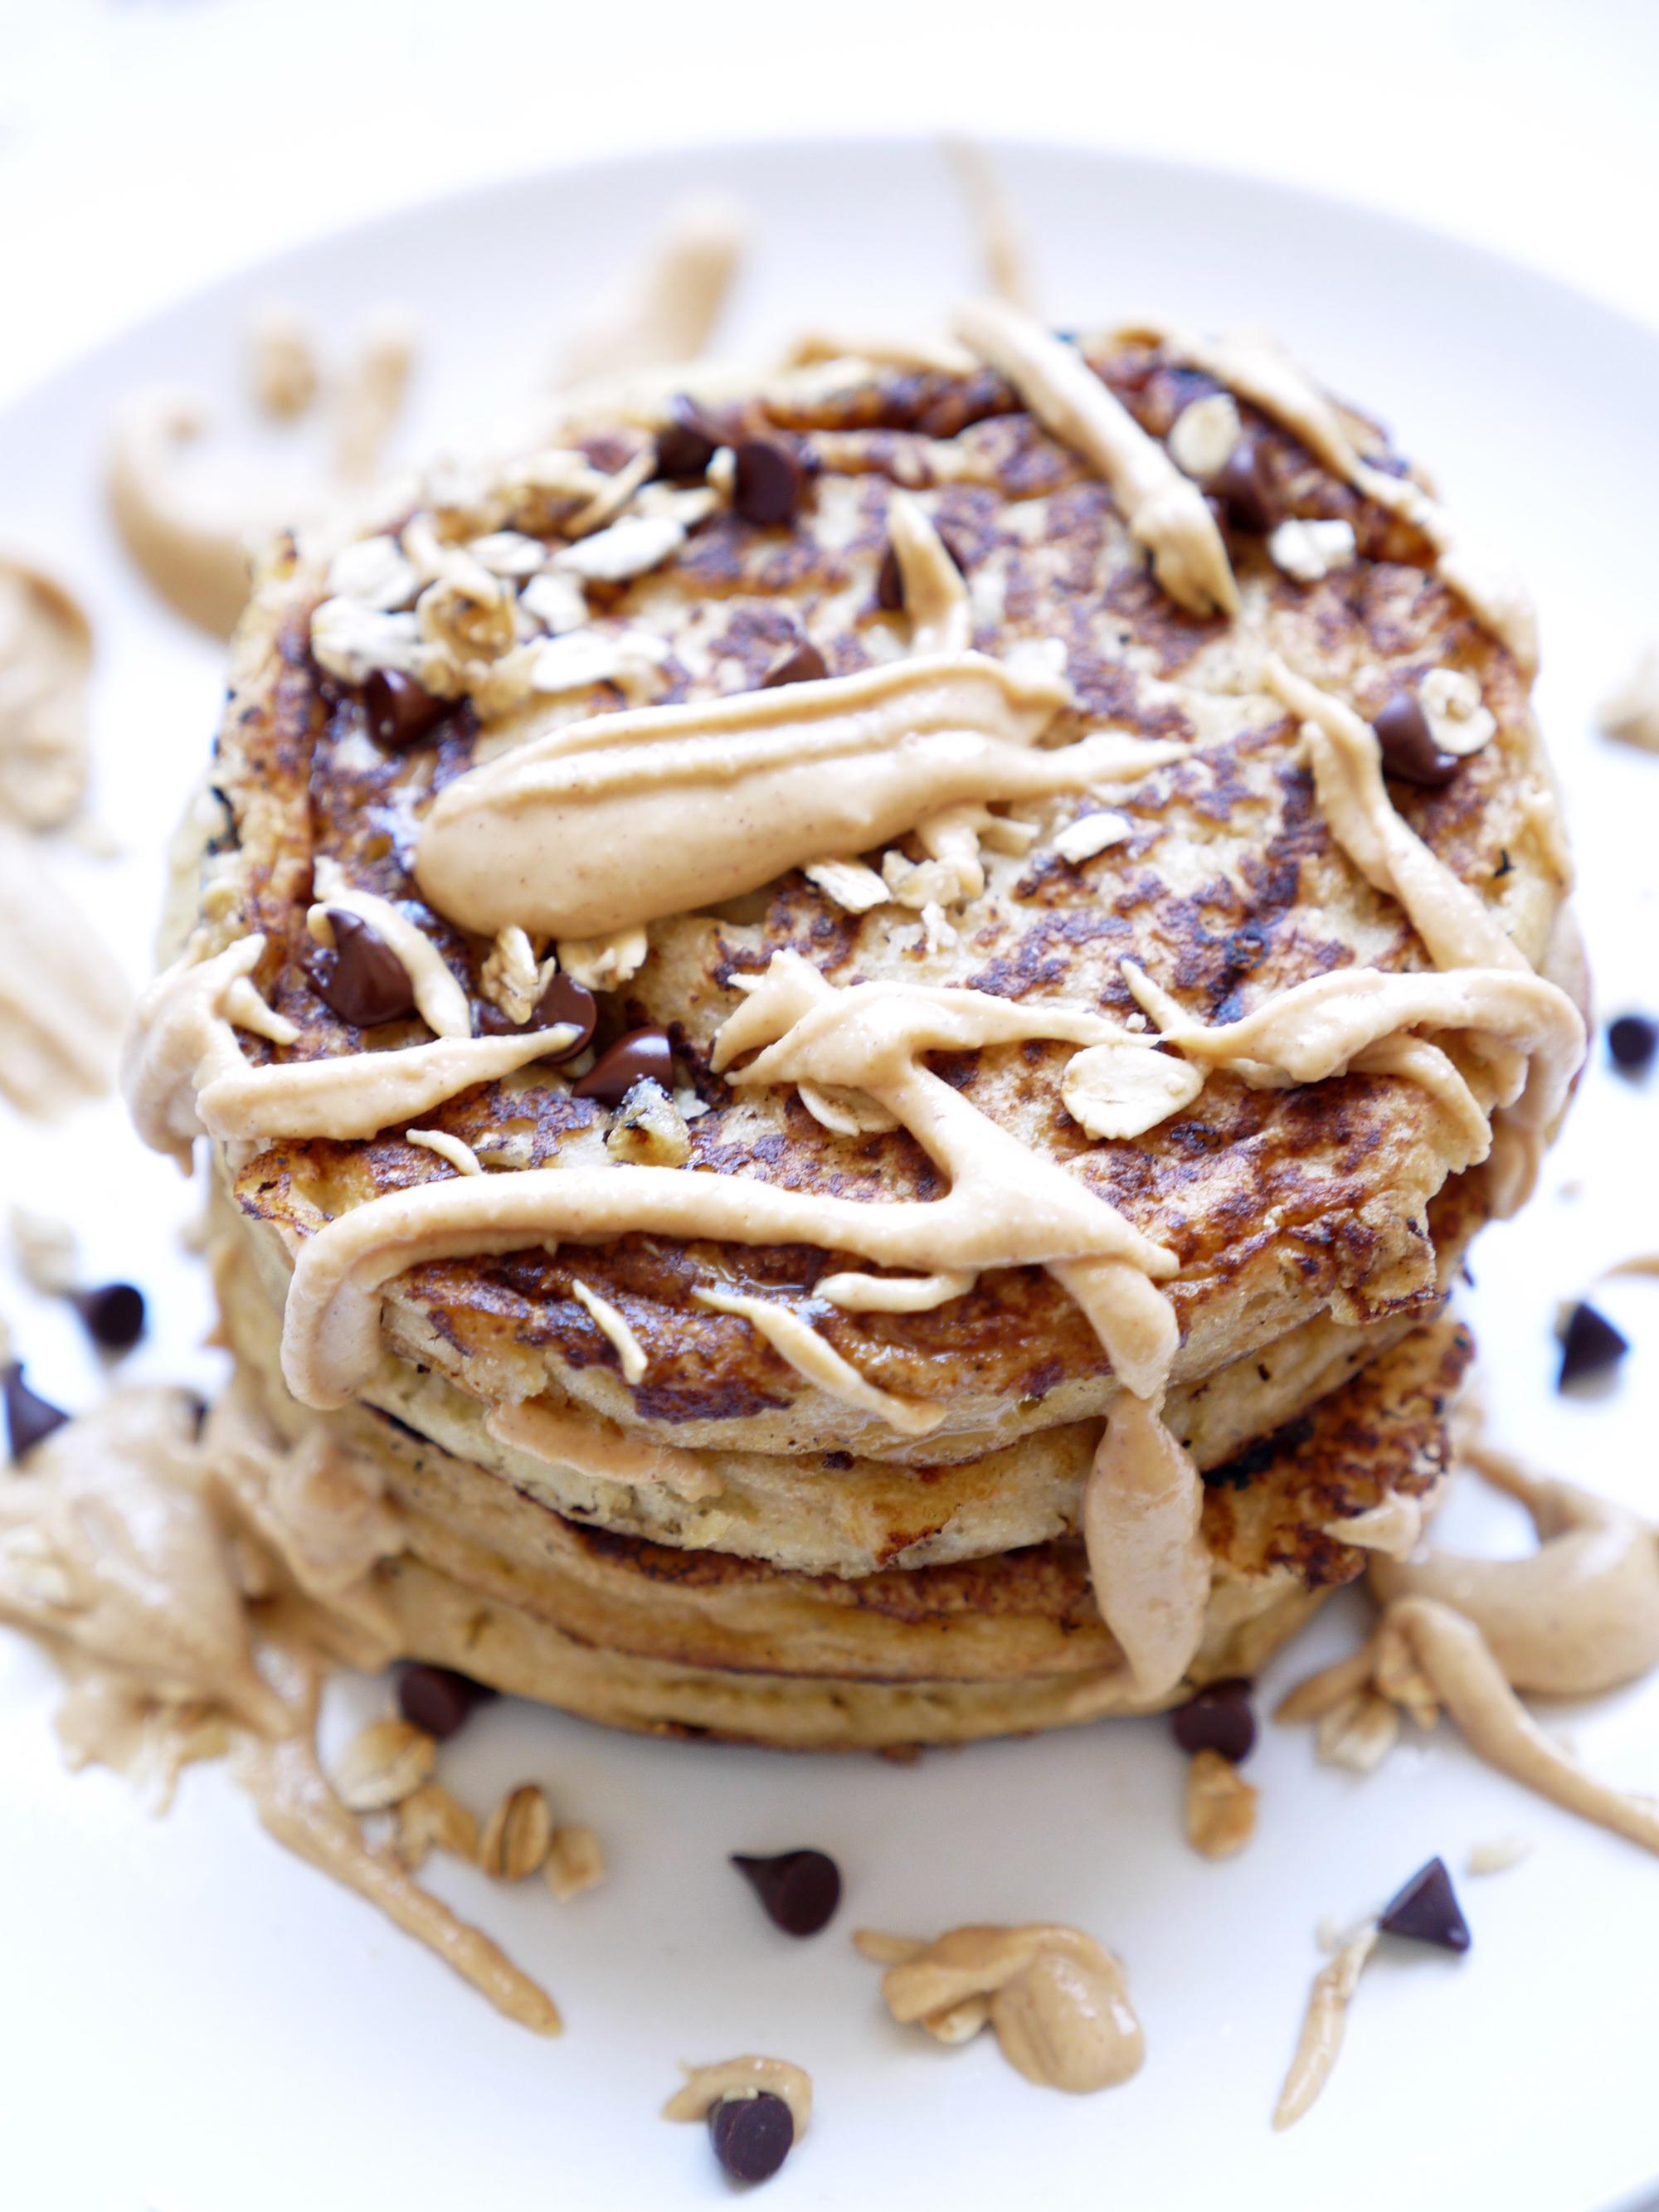 Peanut Butter Chocolate Ricotta Pancakes